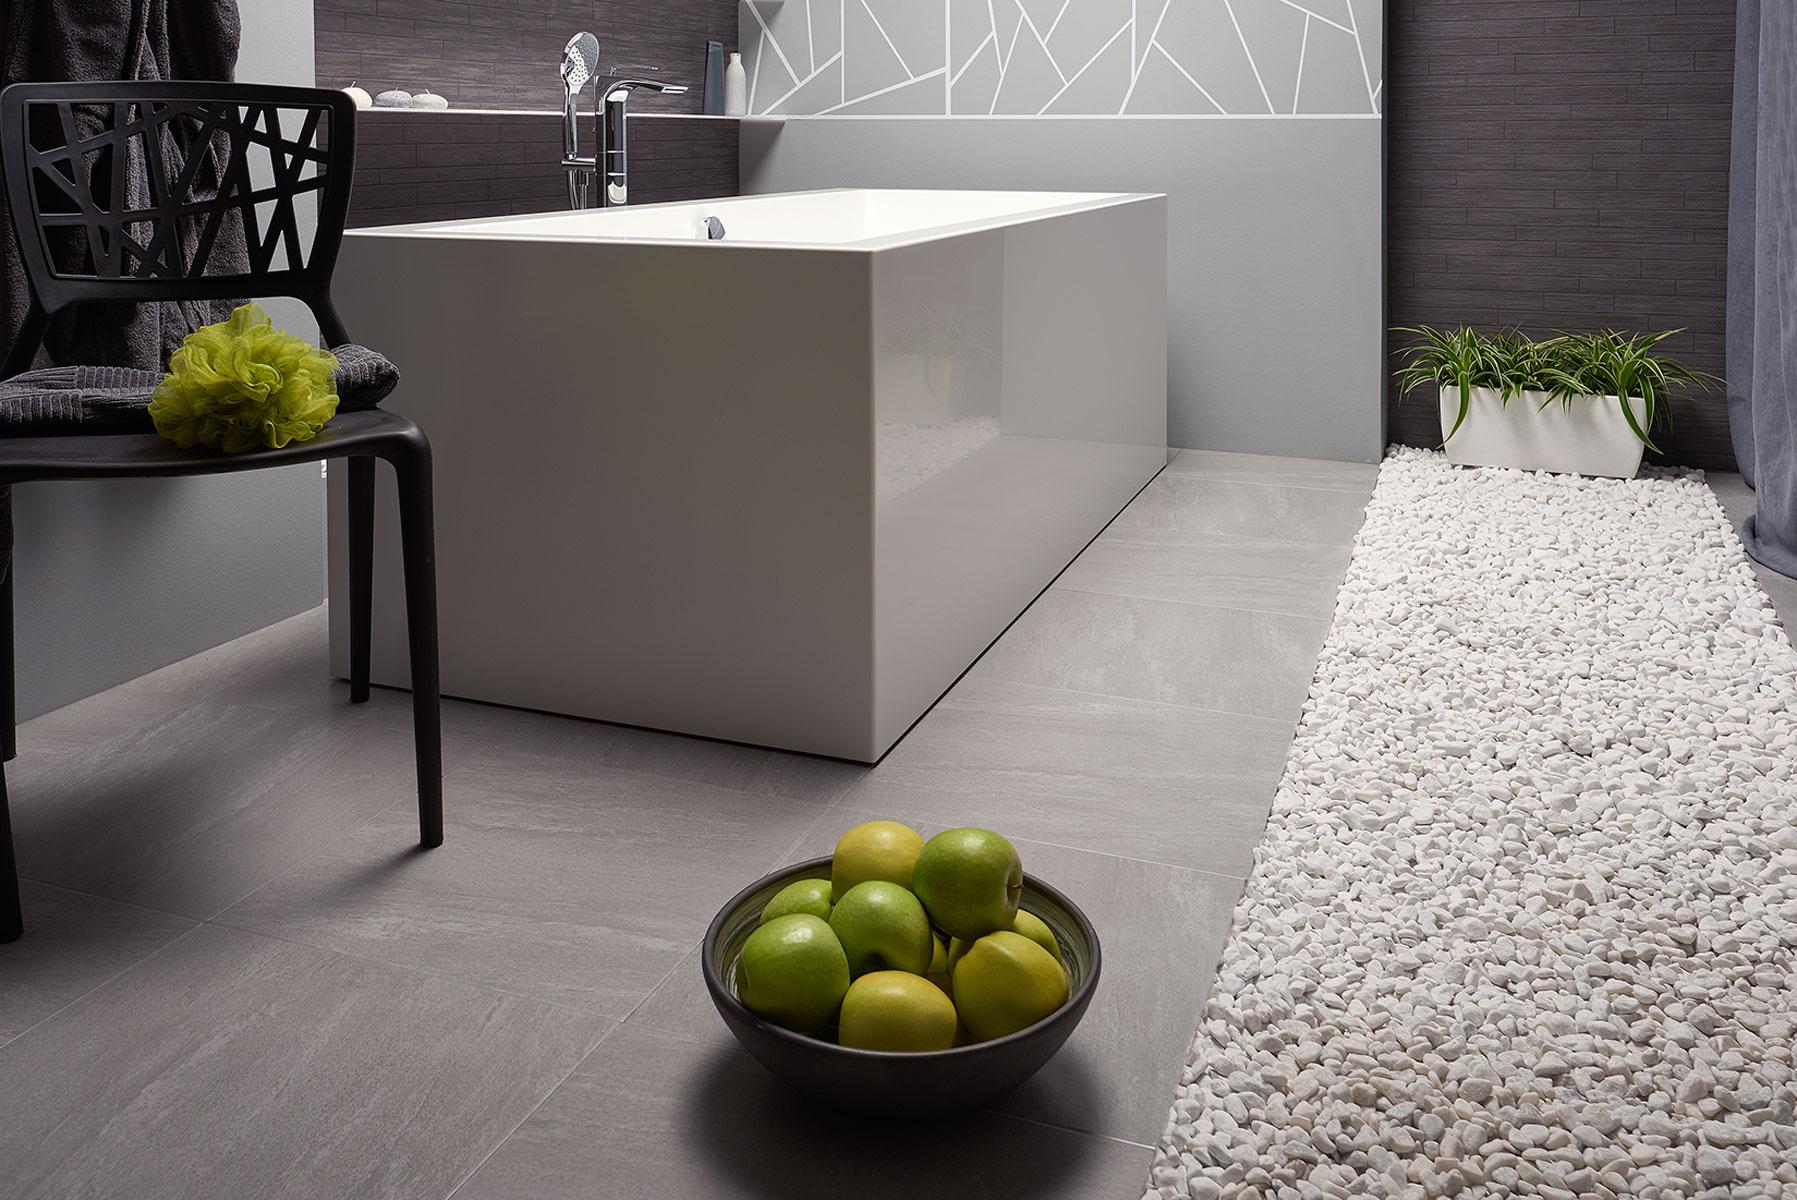 Freestanding Solid Surface Bathtub by Aquatica